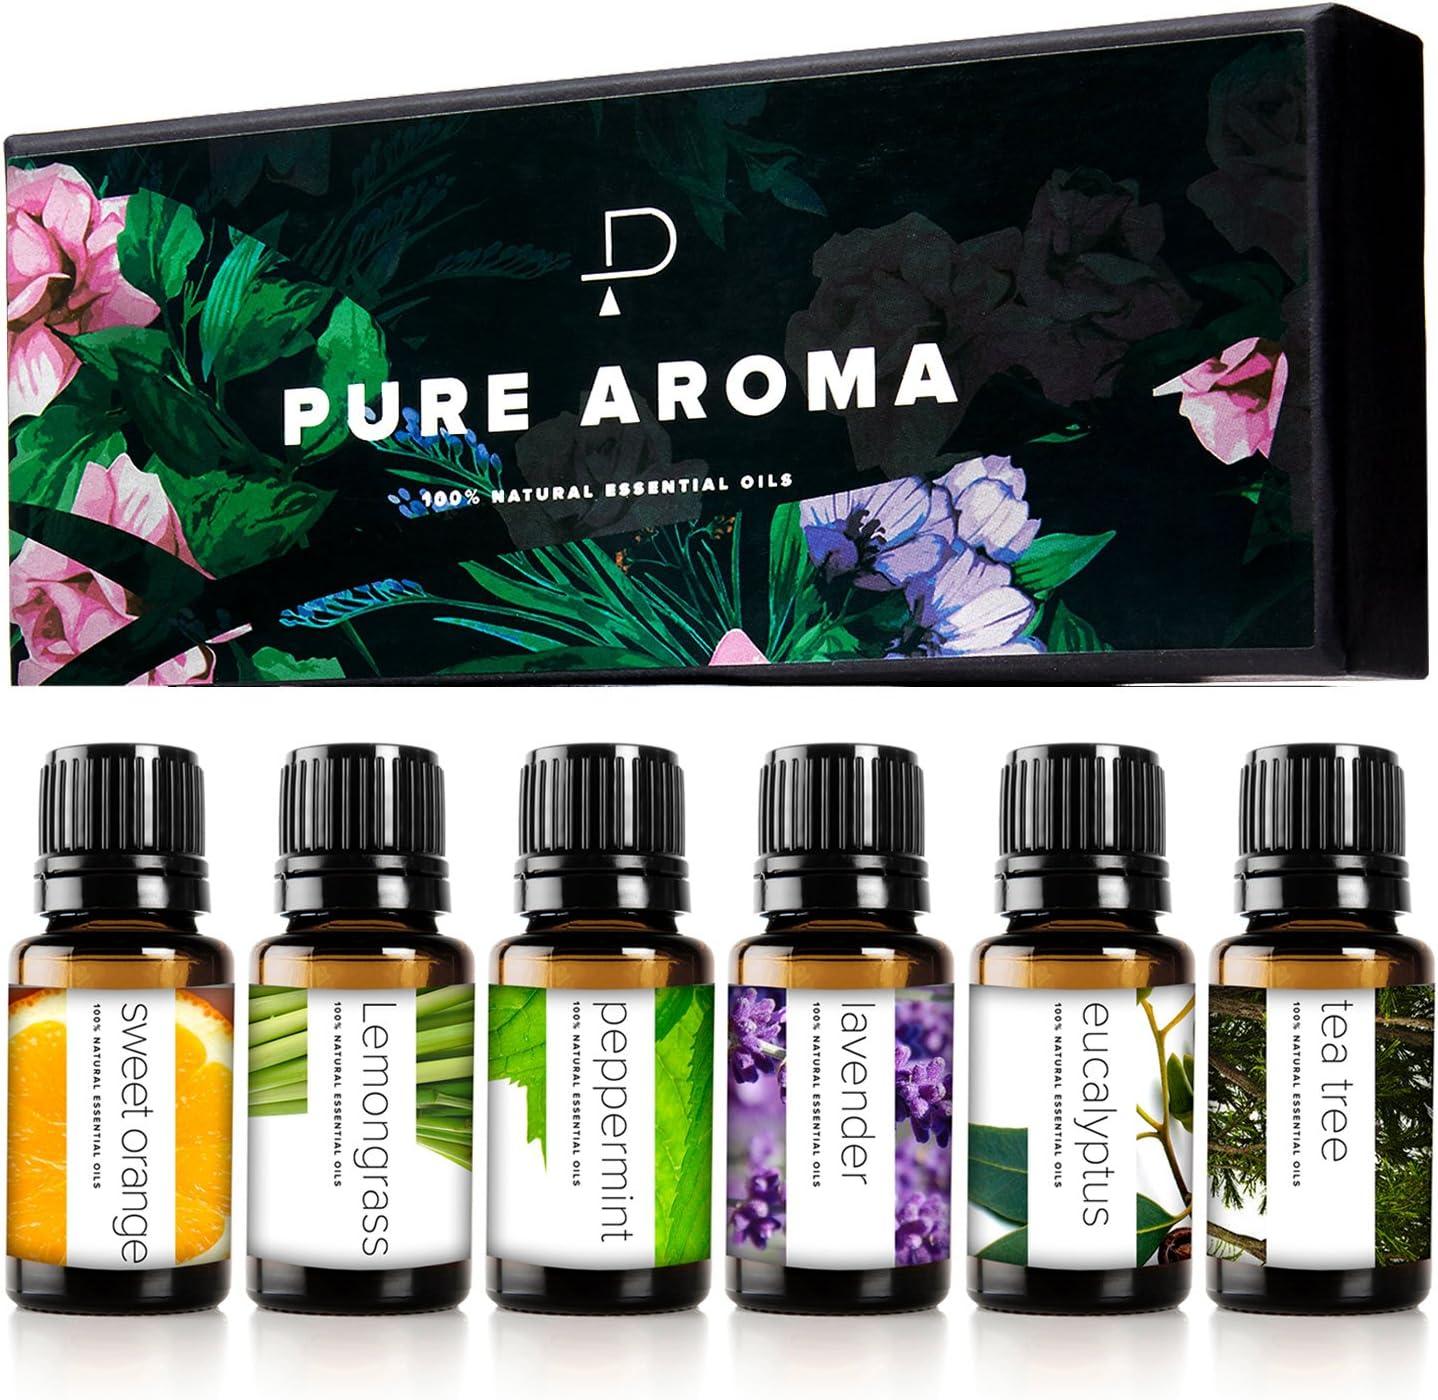 Pure Aroma Aceites esenciales, kit de aceites 100% puros de grado terapéutico - Top 6 Set de regalo de aceites de aromaterapia - Paquete de 6, 10 ml (eucalipto, lavanda, hierba de limón, naranja)